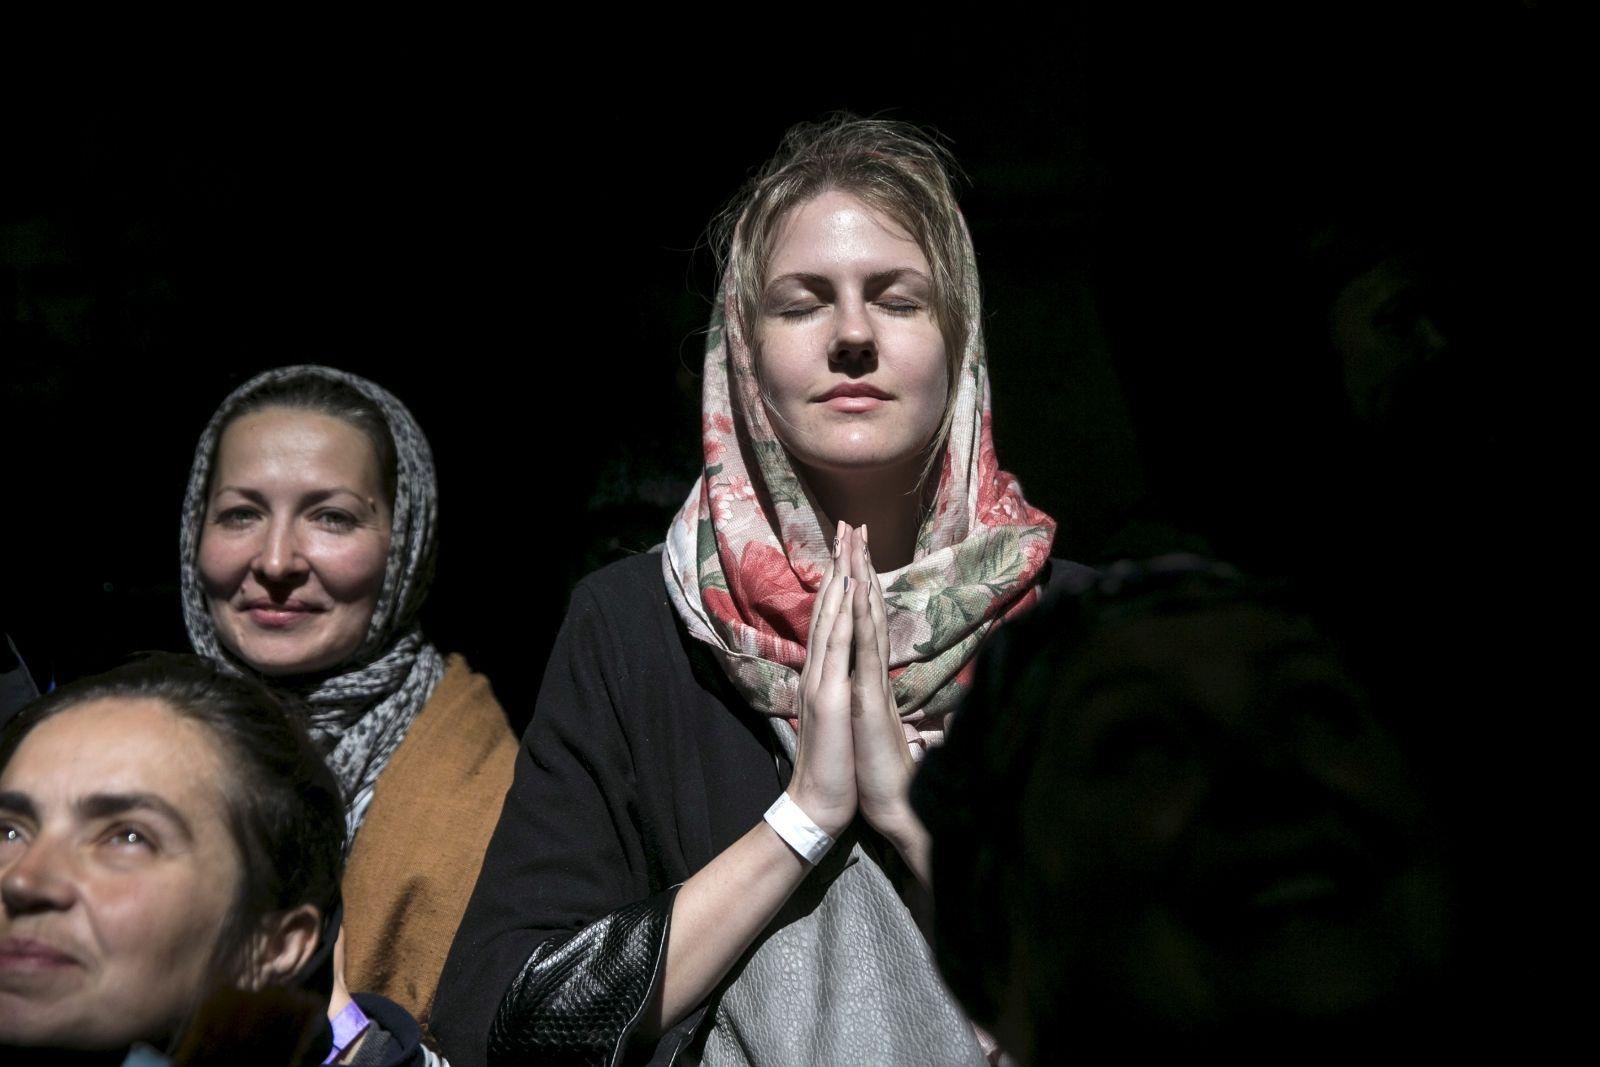 Church worshipper prays